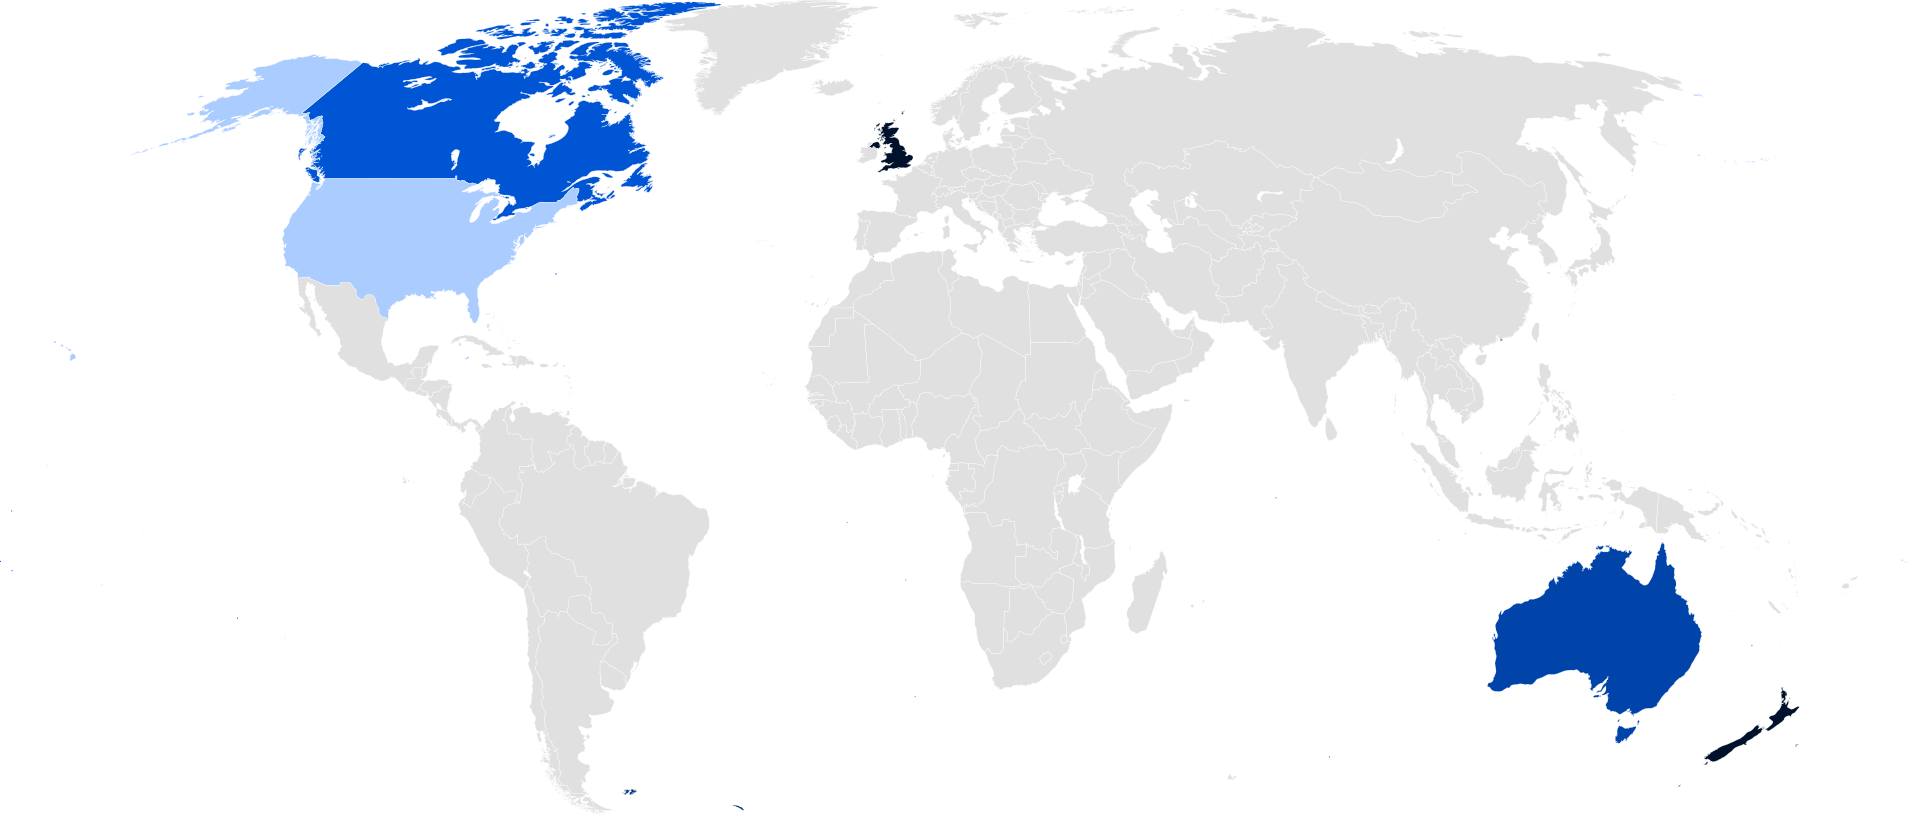 Madison : 1984 orwell map